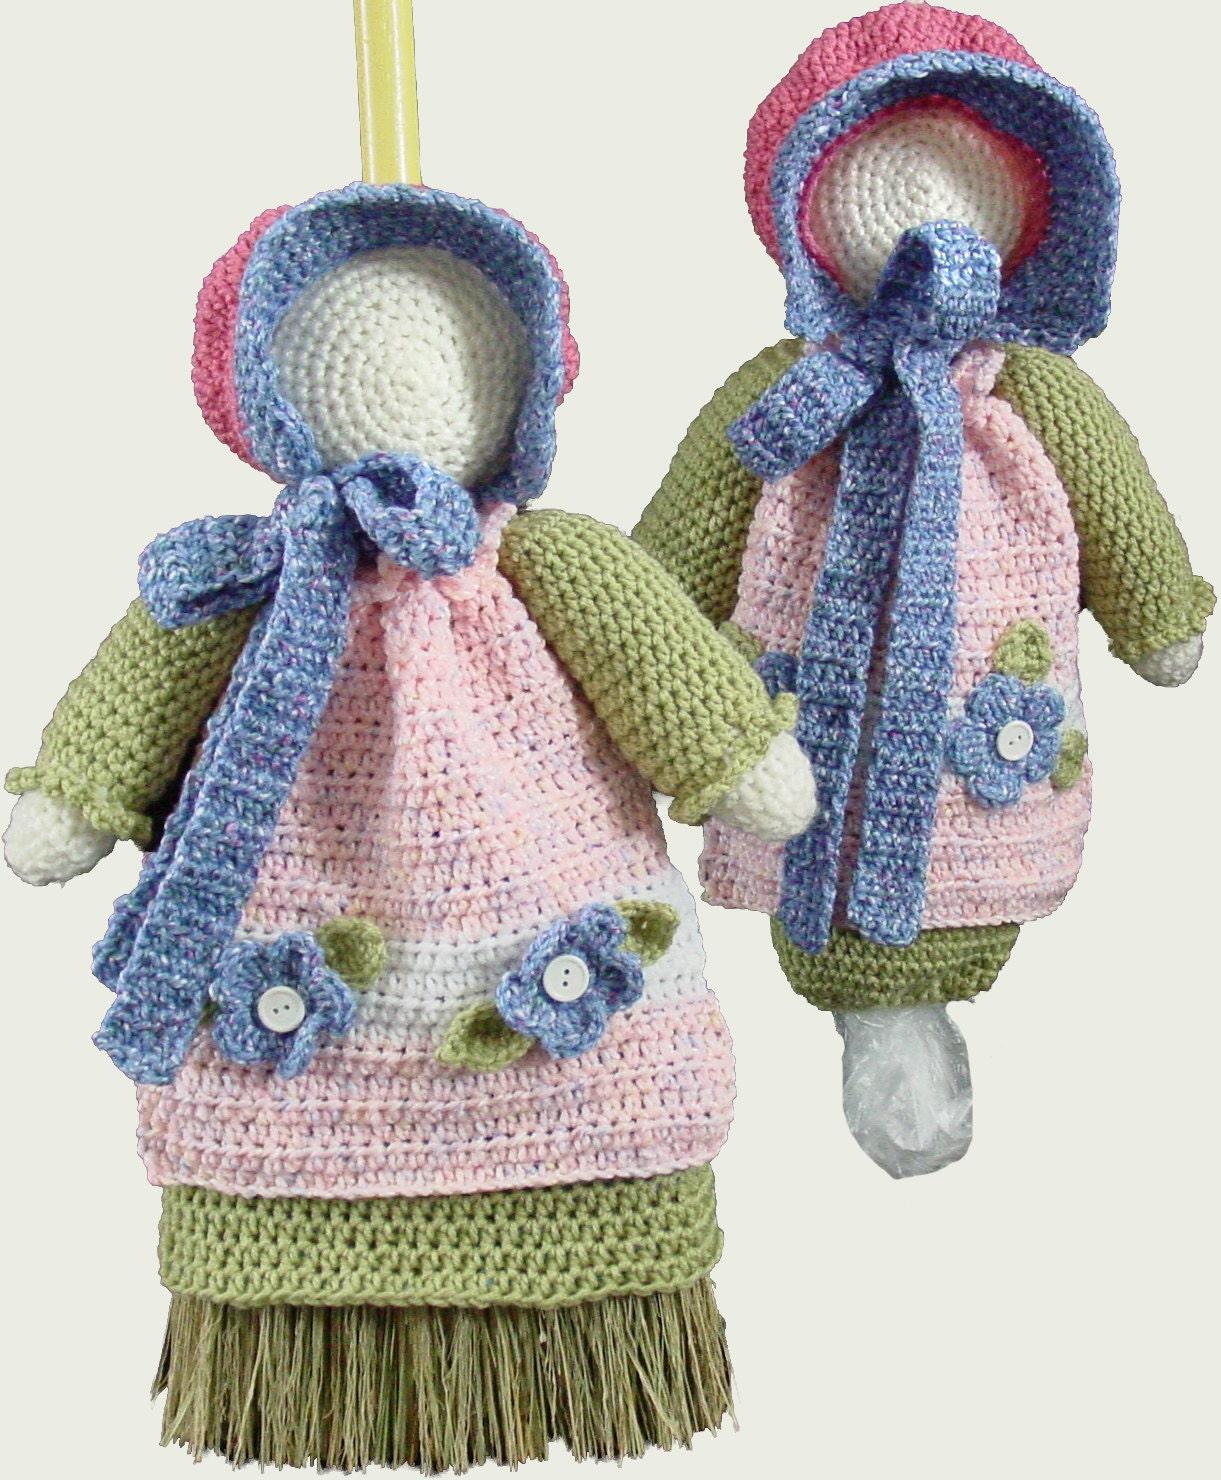 Crochet Bag Keeper Pattern : Sunbonnet Sue Broom Cover and Bag Keeper Crochet Pattern PDF